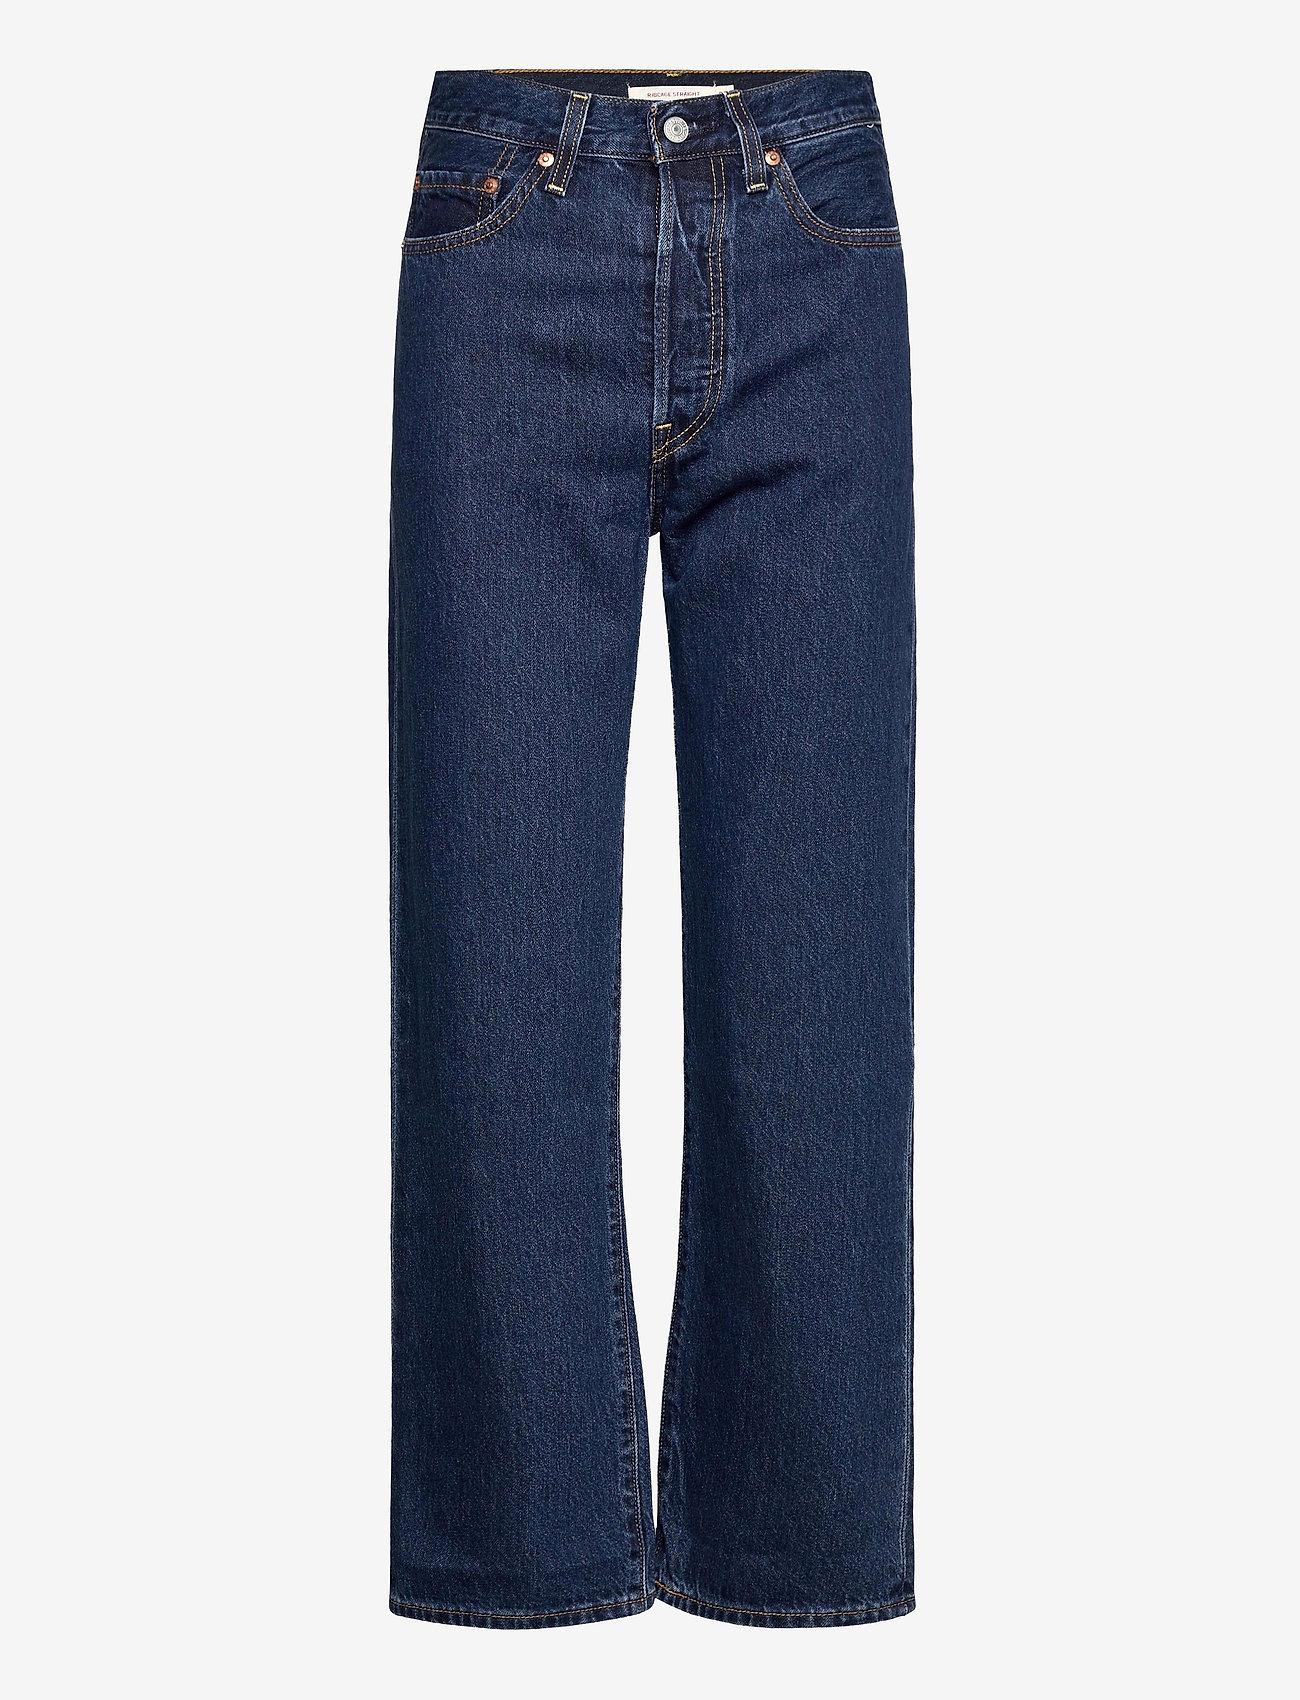 LEVI´S Women - RIBCAGE STRAIGHT ANKLE NOE DAR - brede jeans - dark indigo - flat finish - 0